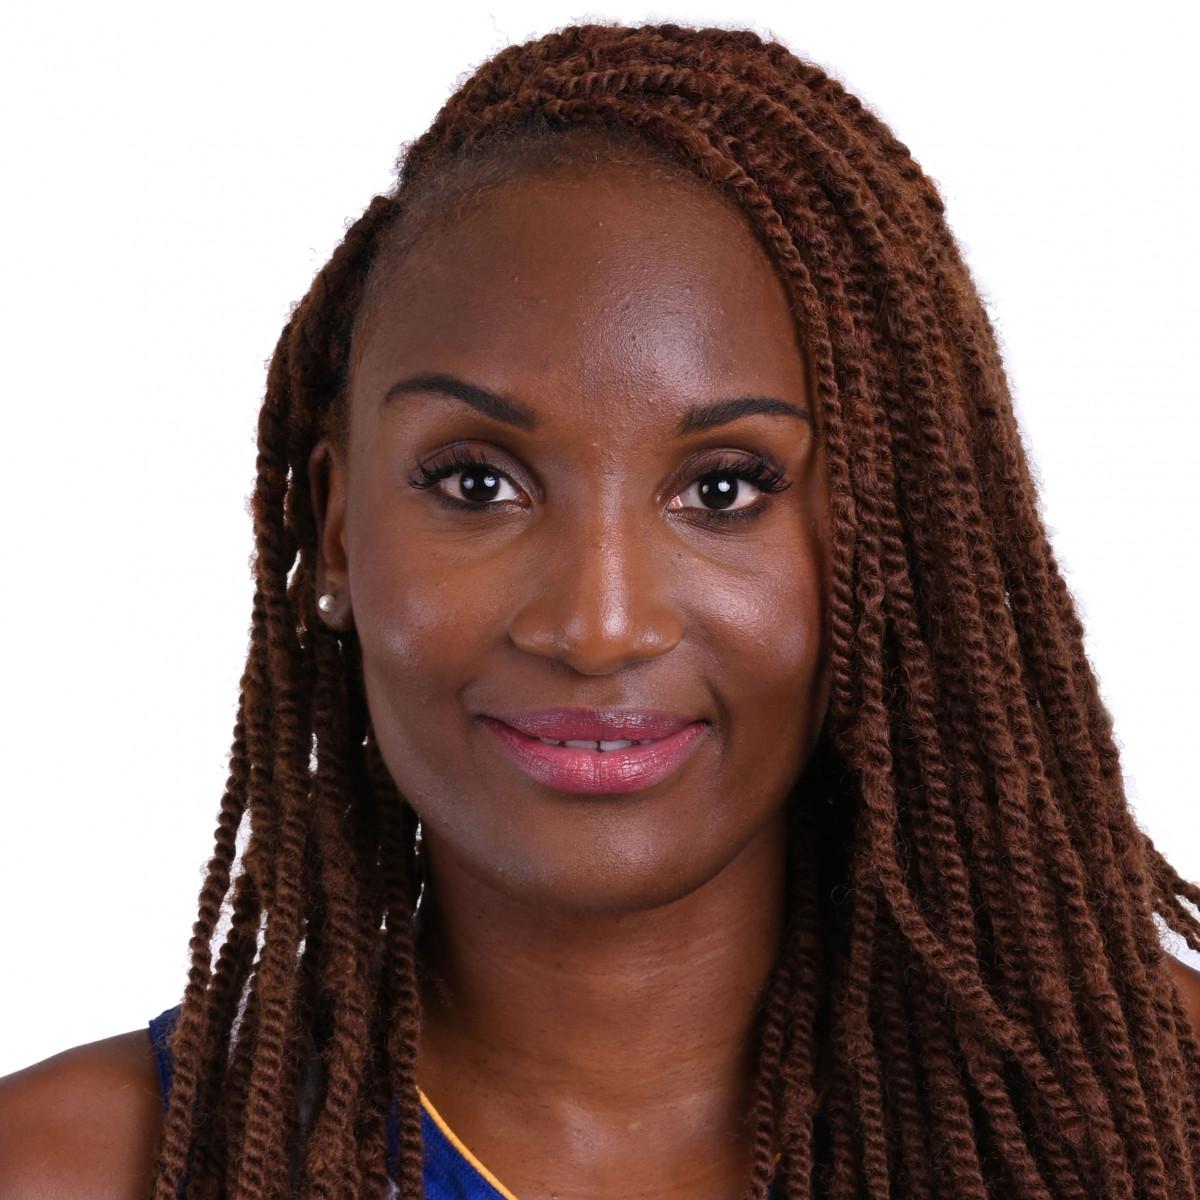 Laetitia Kamba